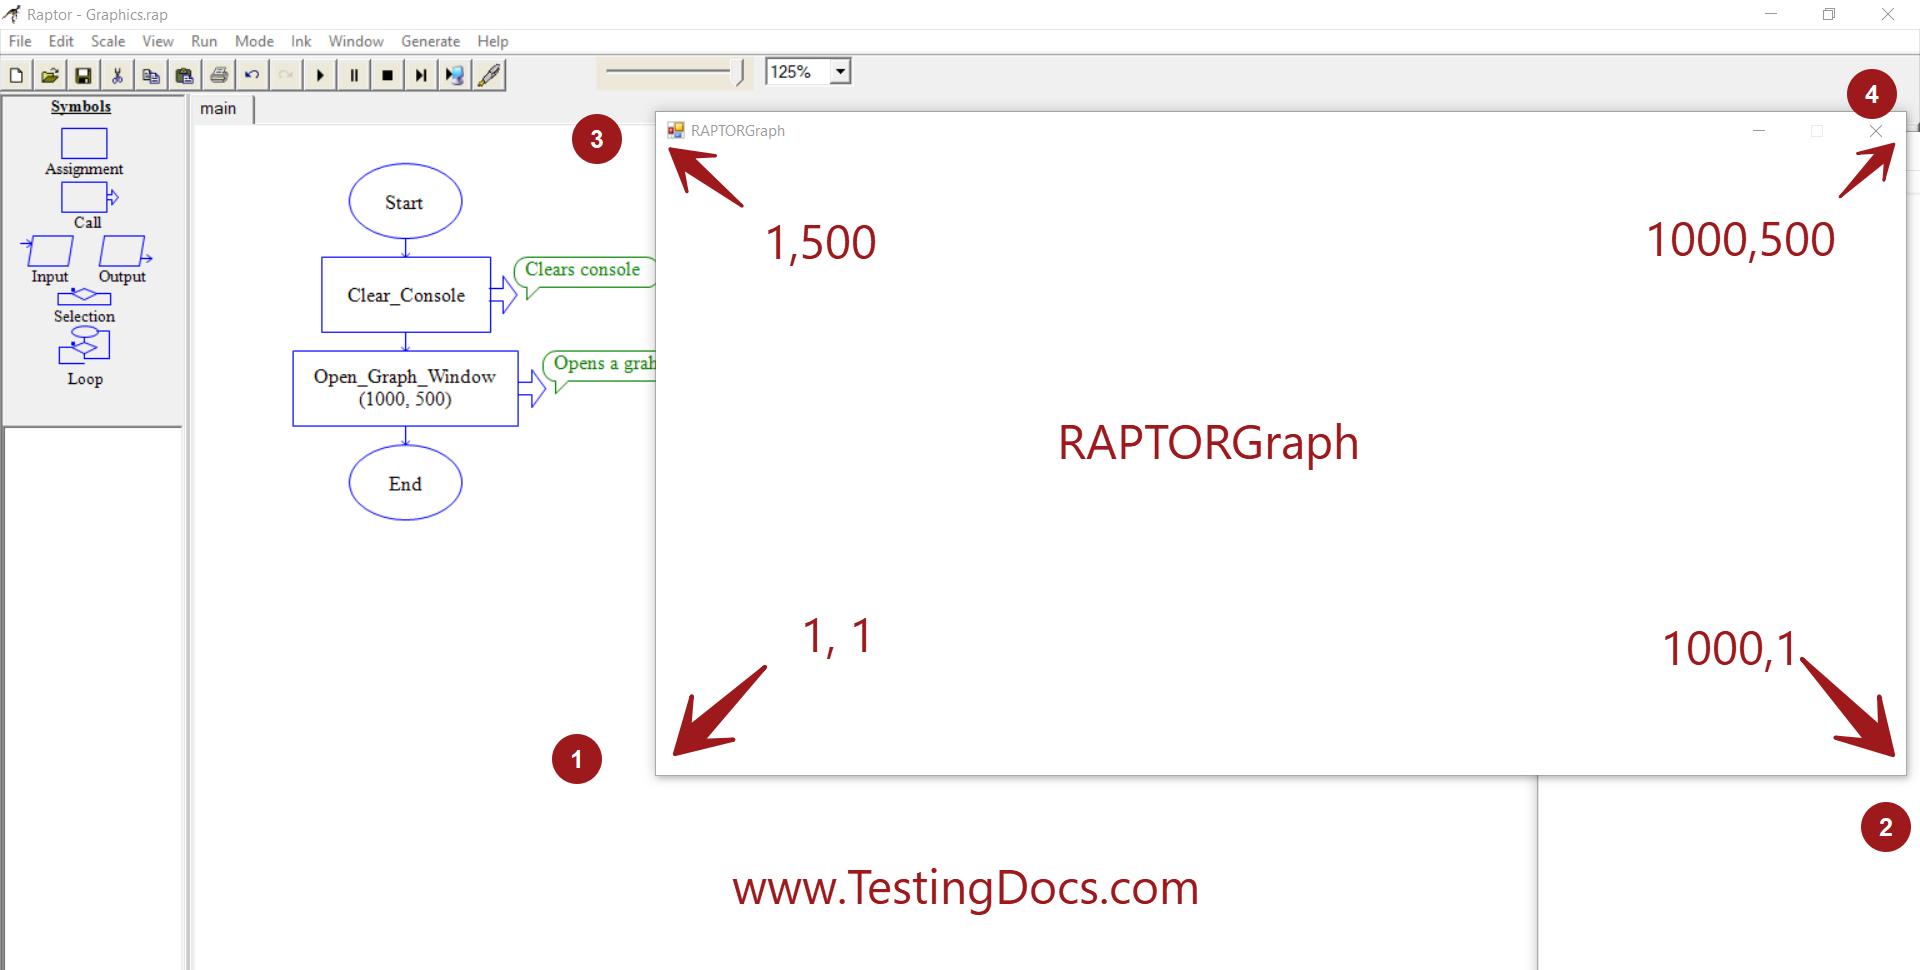 RaptorGraph Window Coordinates